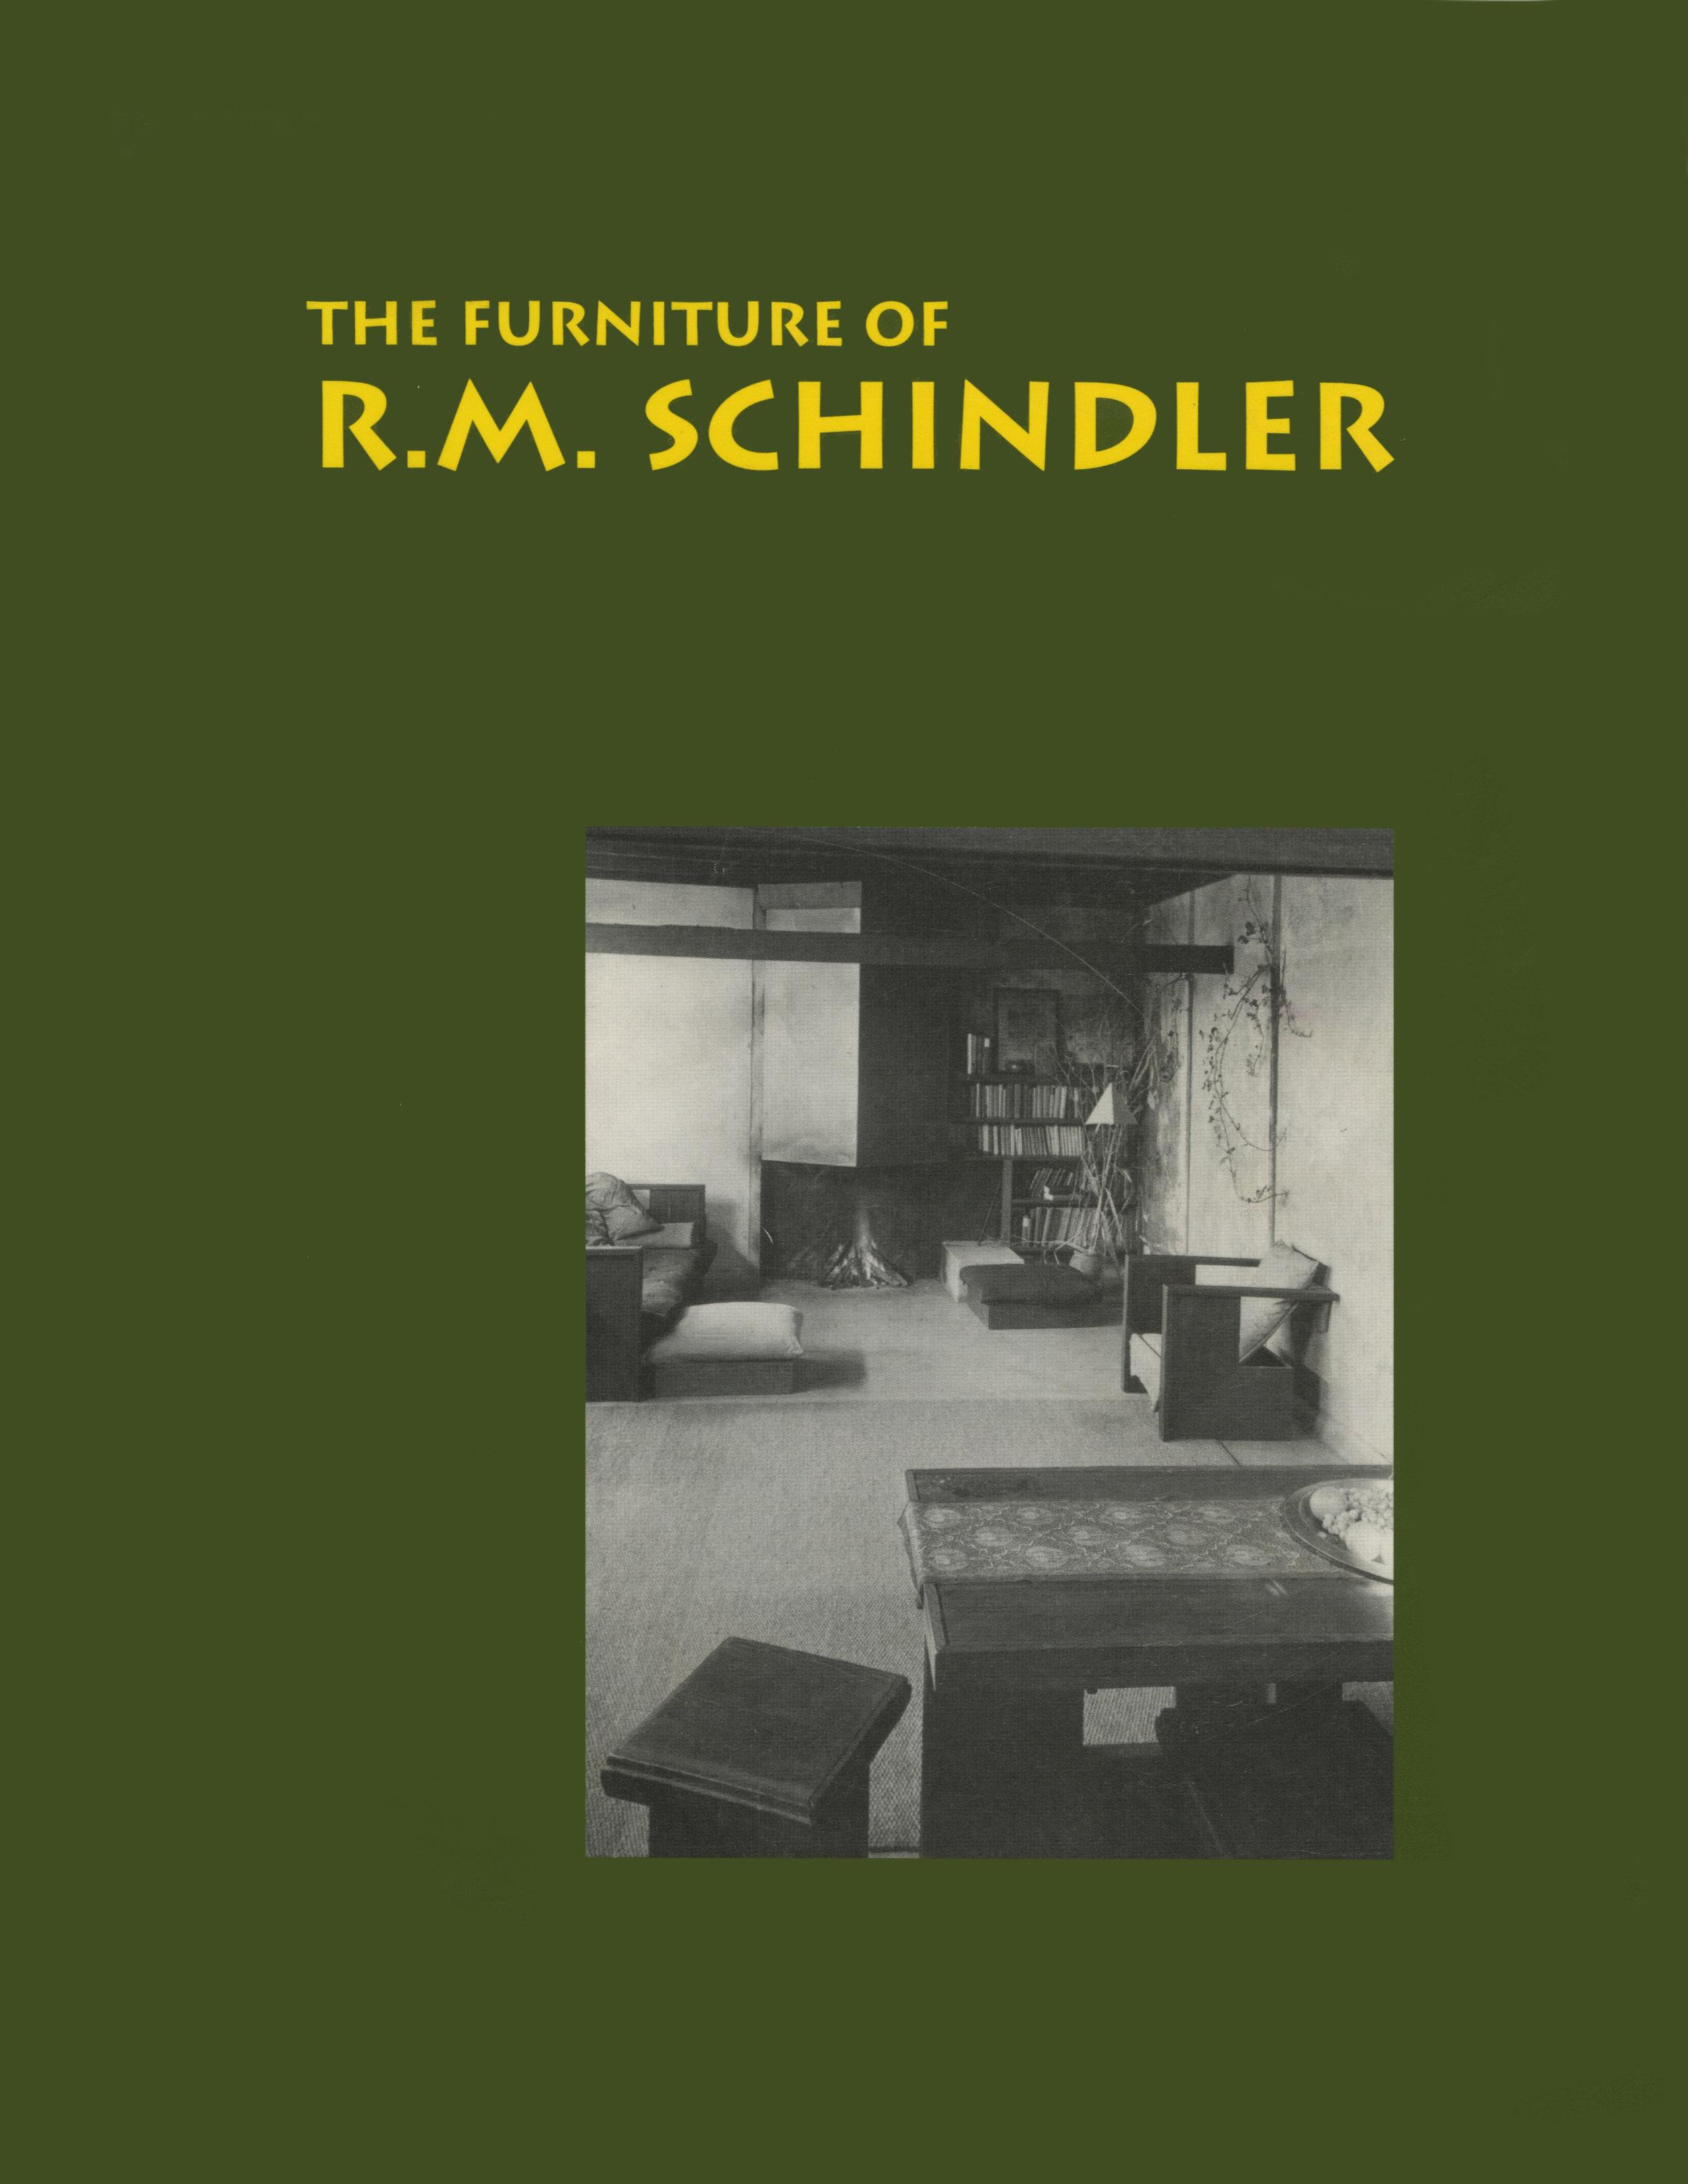 THE FURNITURE OF R.M. SCHINDLER_webcover.jpg